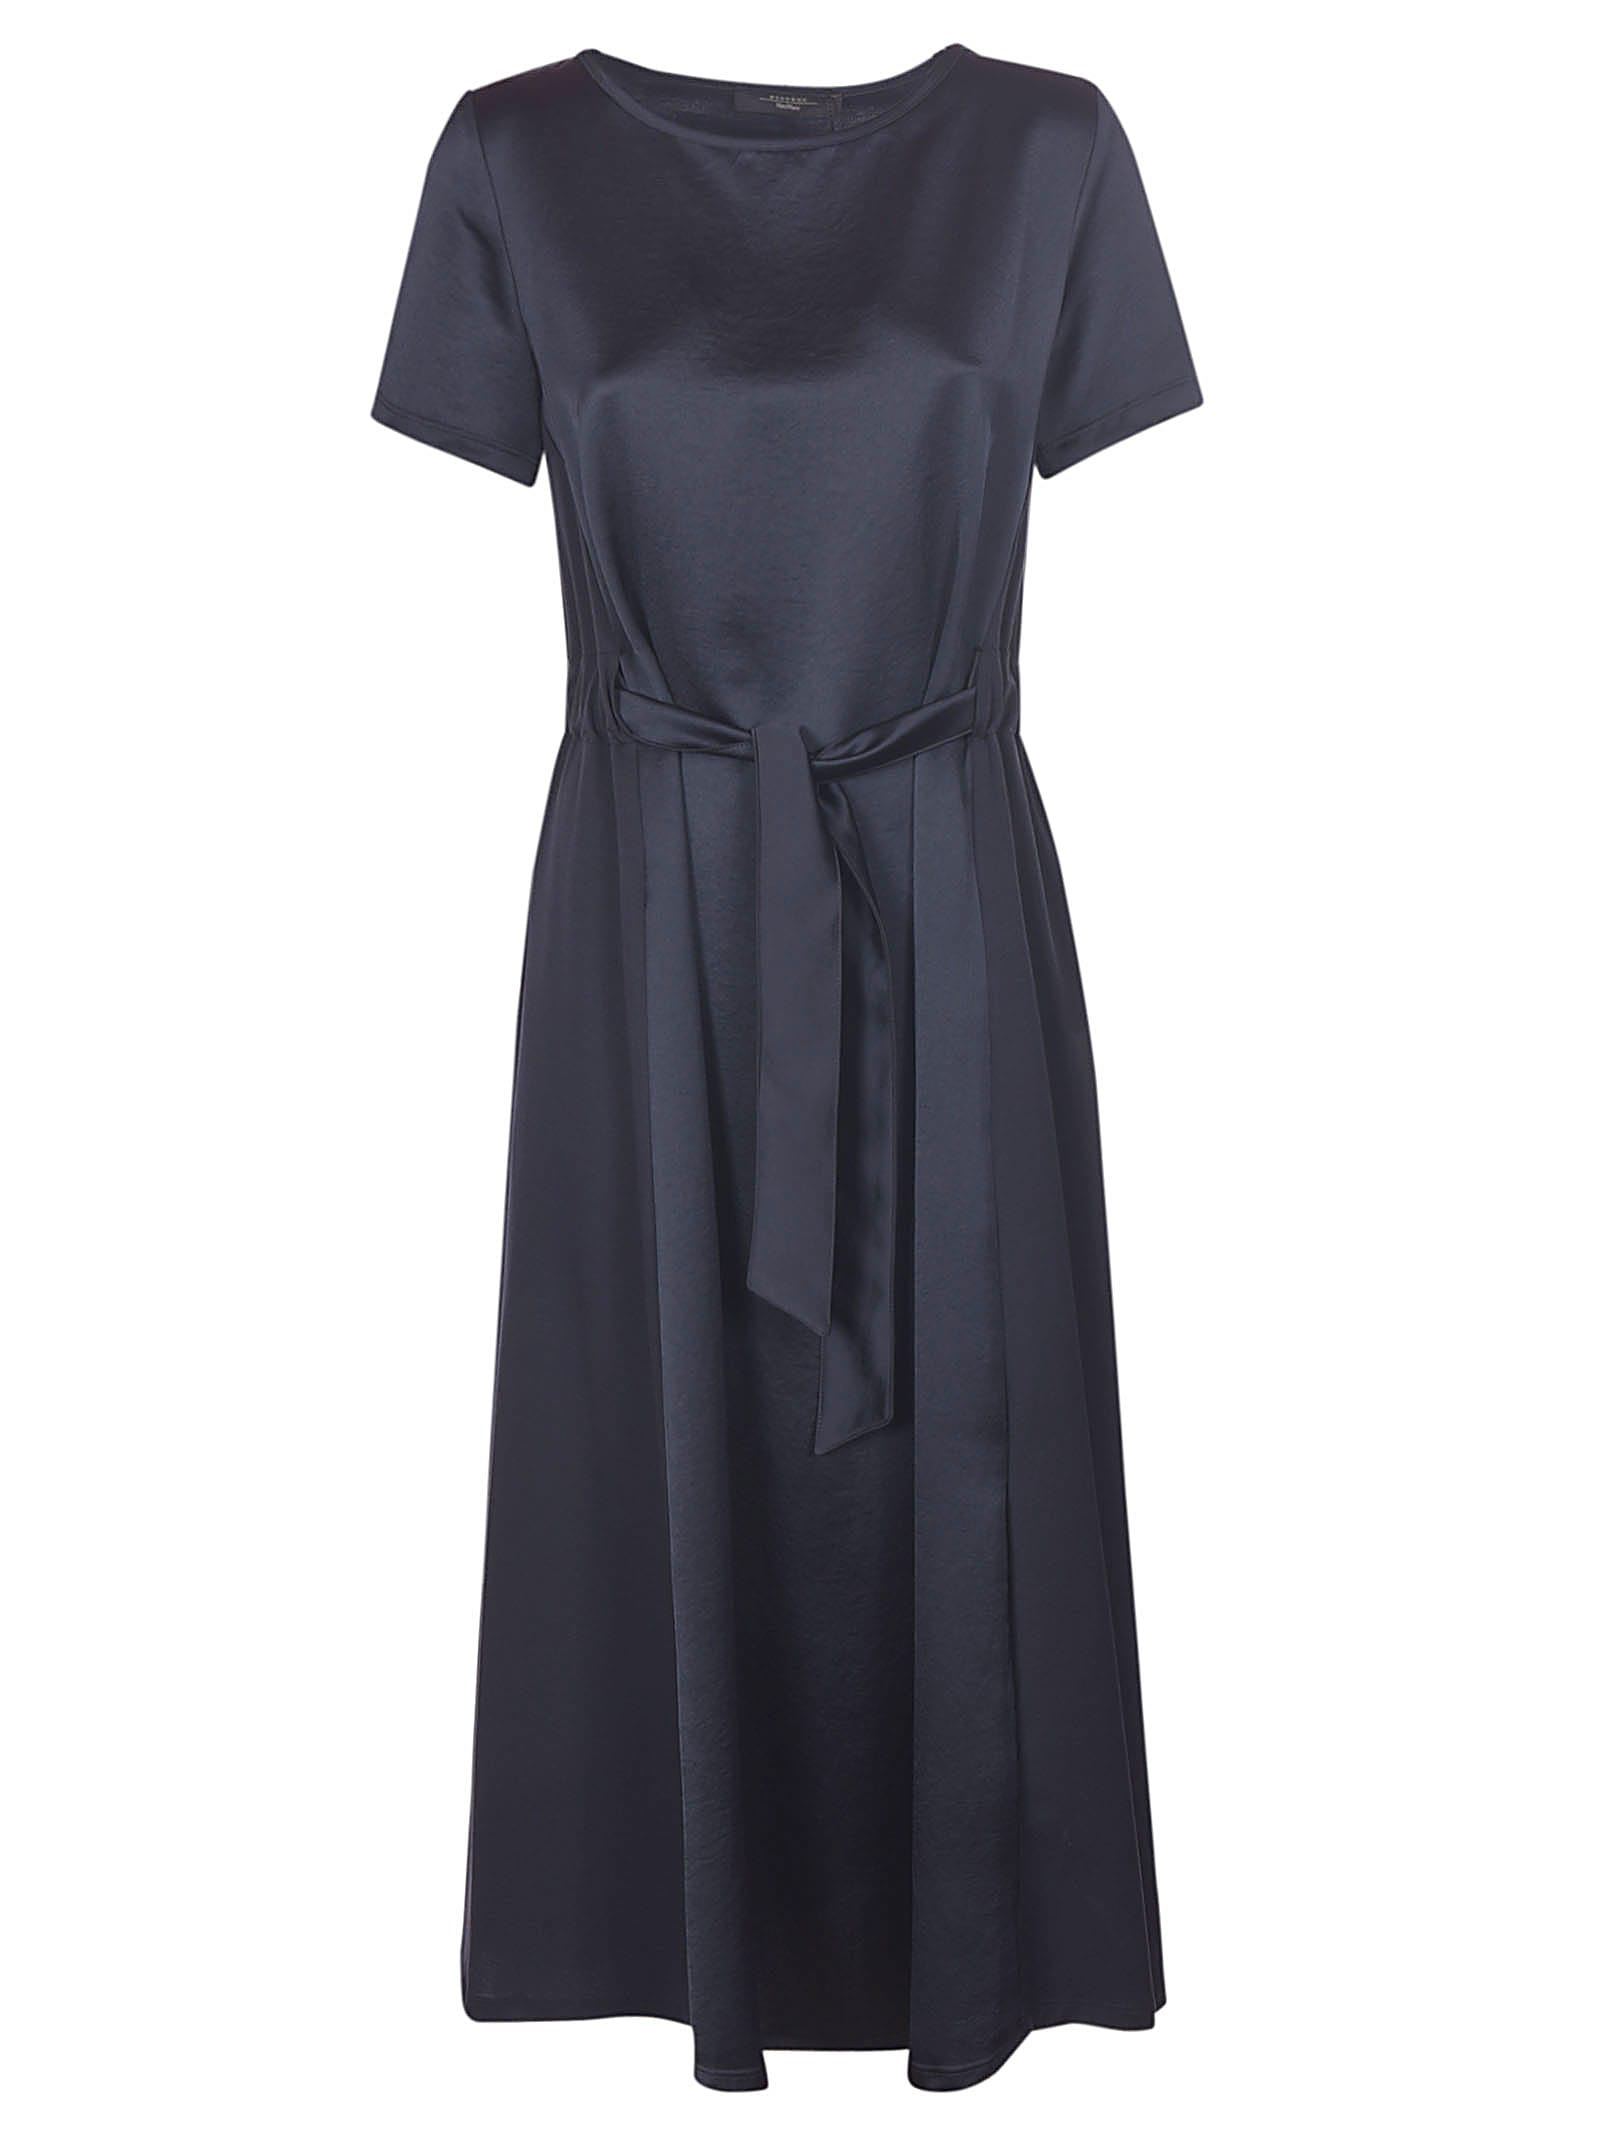 Buy Weekend Max Mara Giro Dress online, shop Weekend Max Mara with free shipping